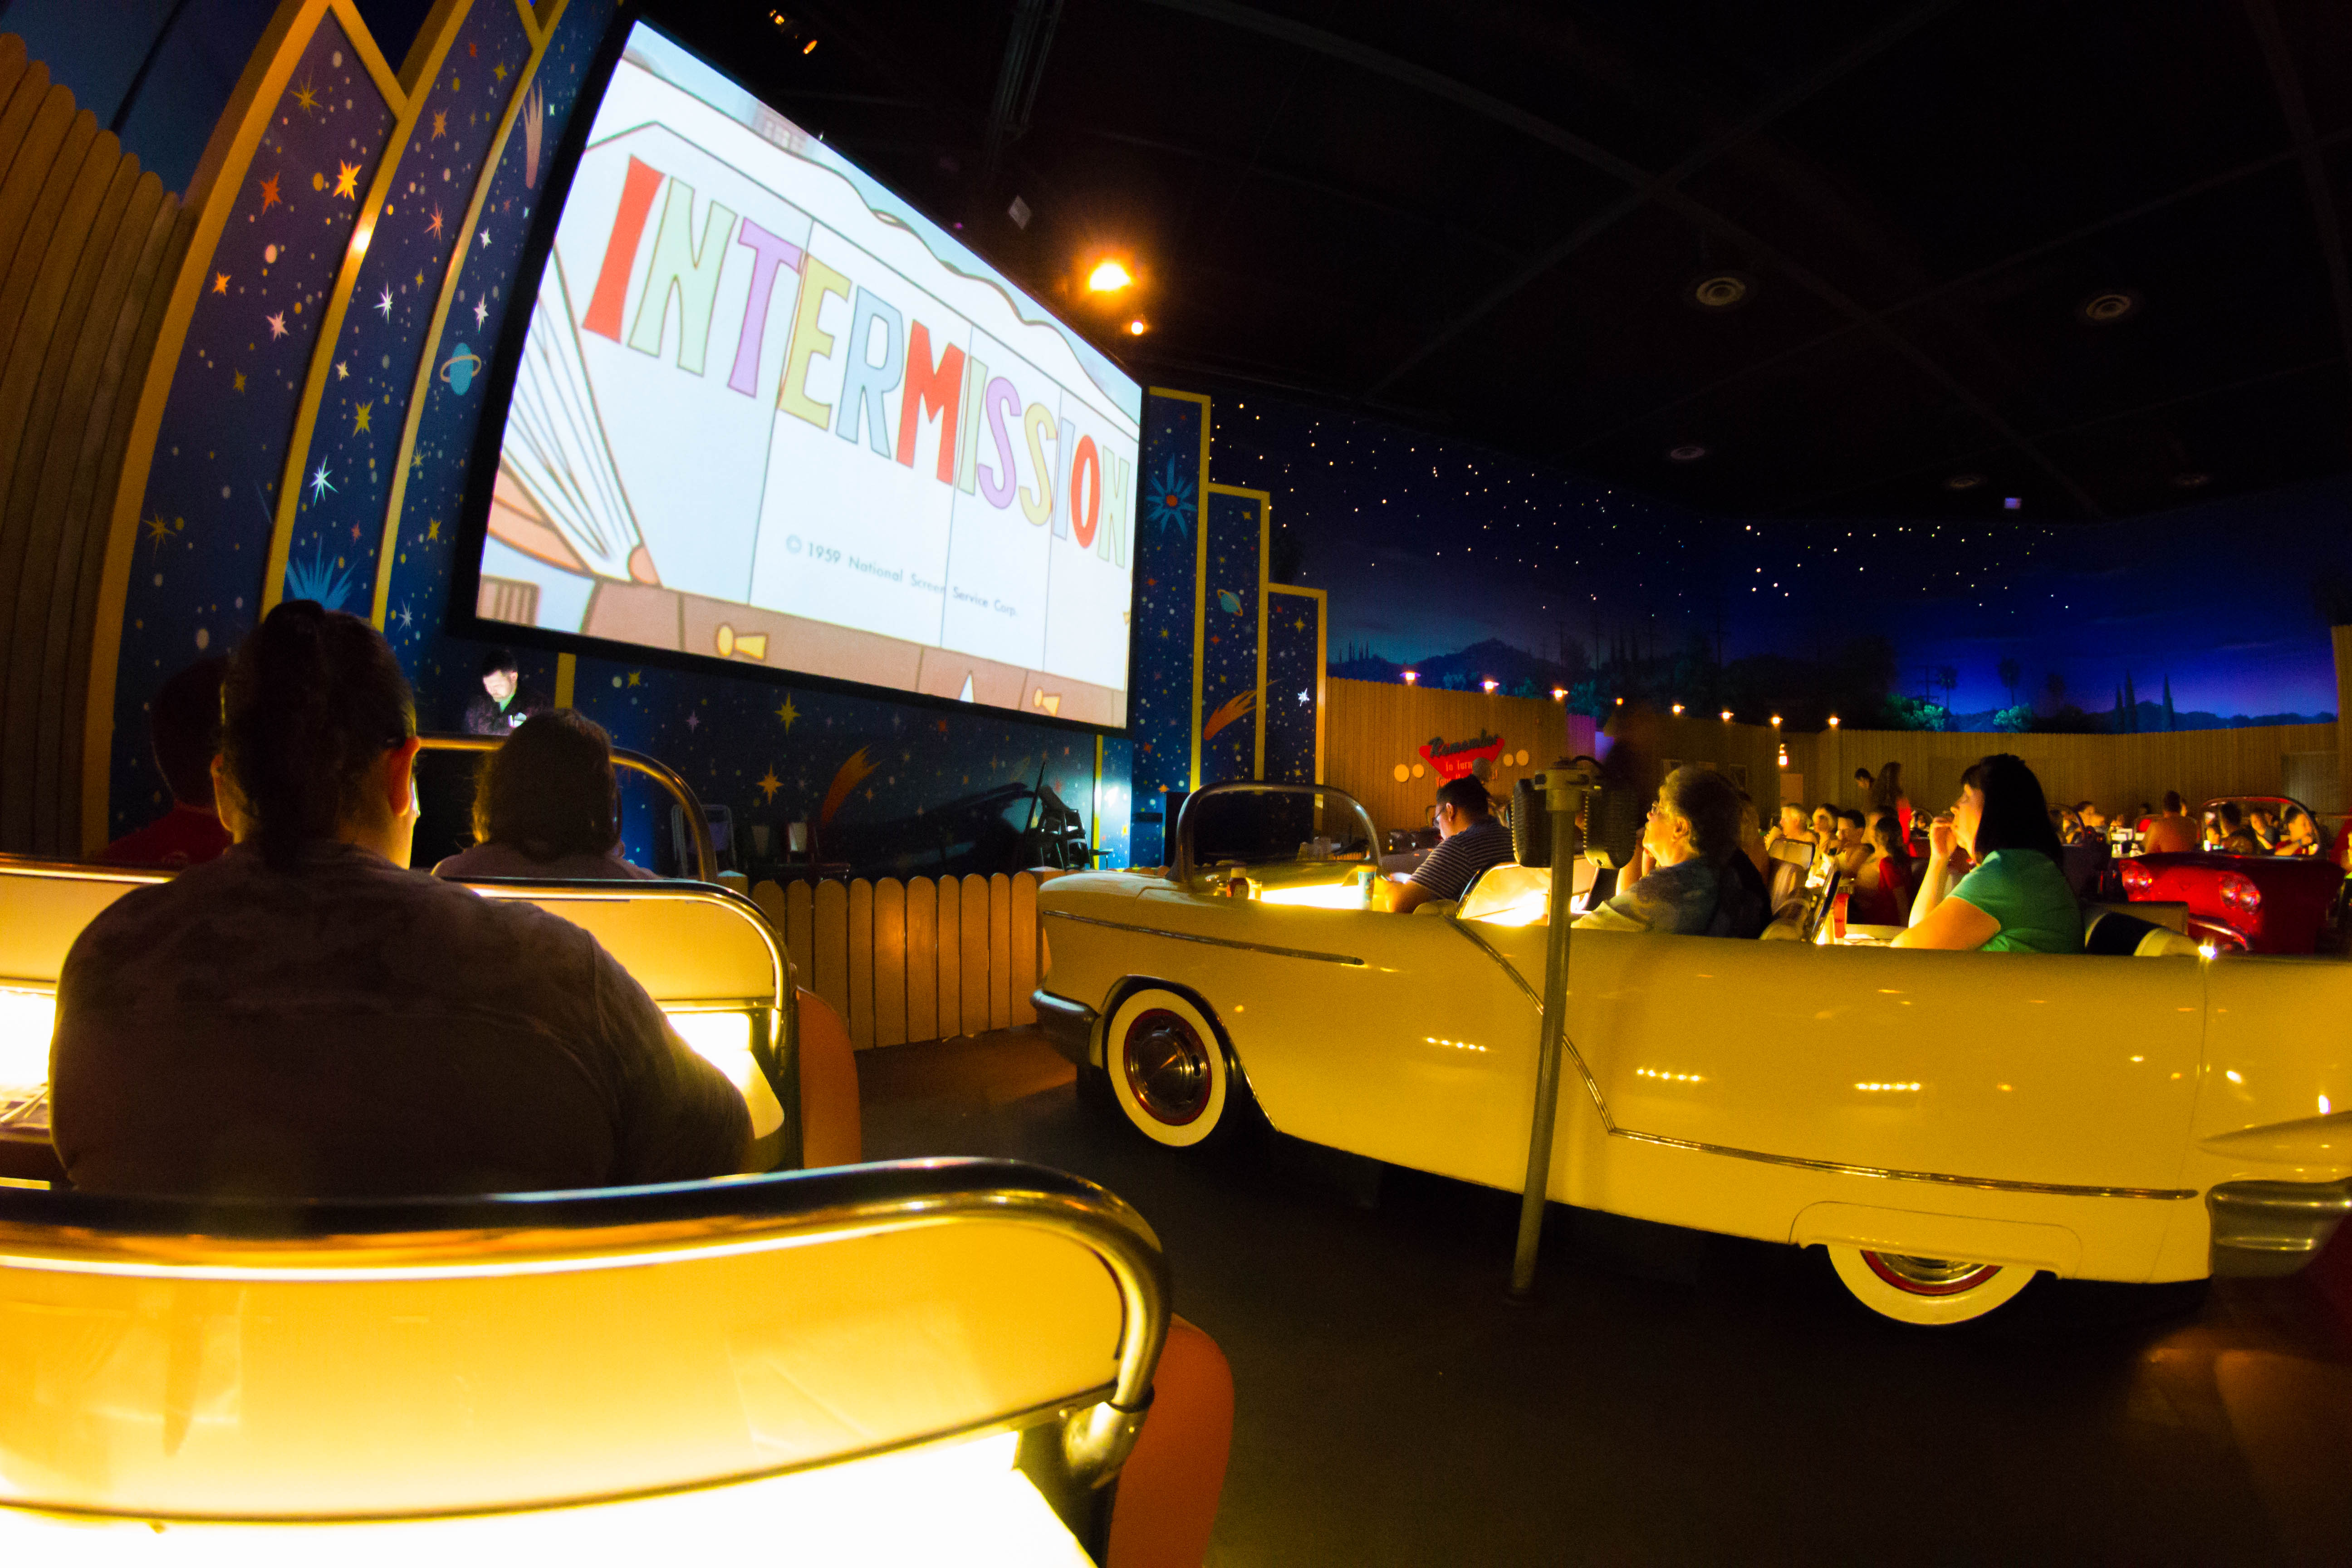 Dining - Sci-Fi Dine-In Restaurant Cars